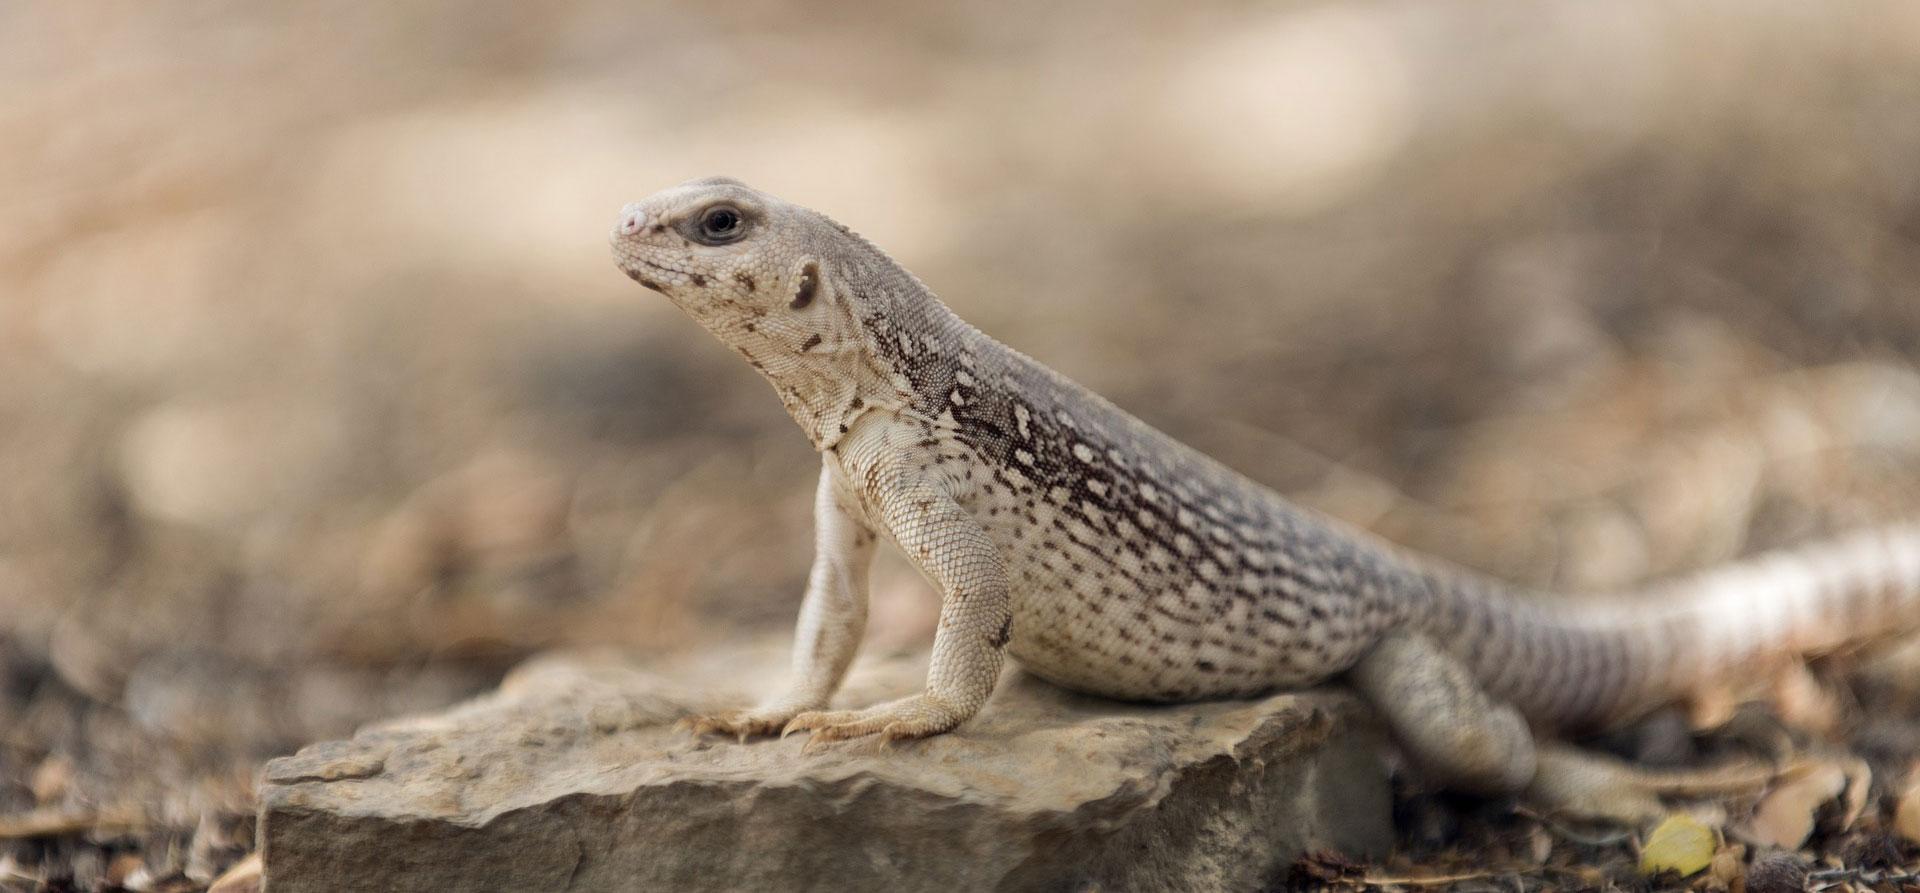 Desert Iguana Zoo Med Laboratories Inc